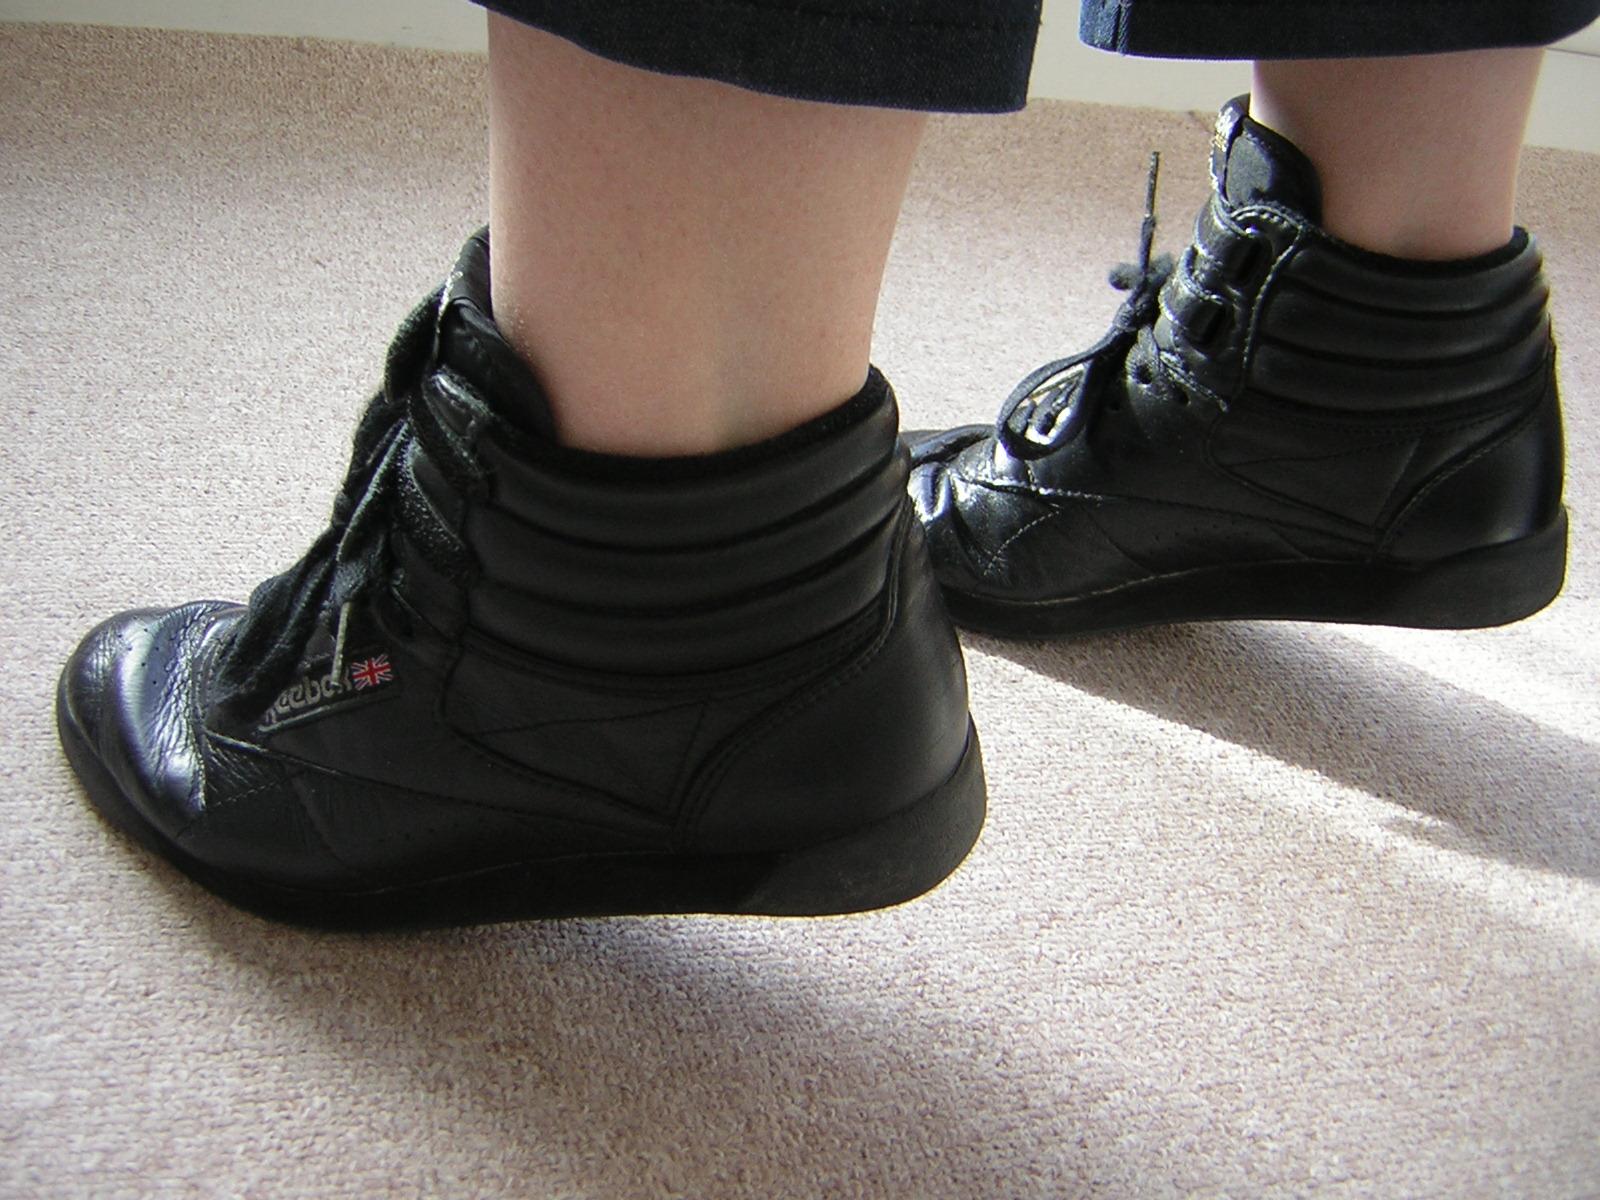 Reebok Taille   Hommeconverse One Star Skate Shoe Skate